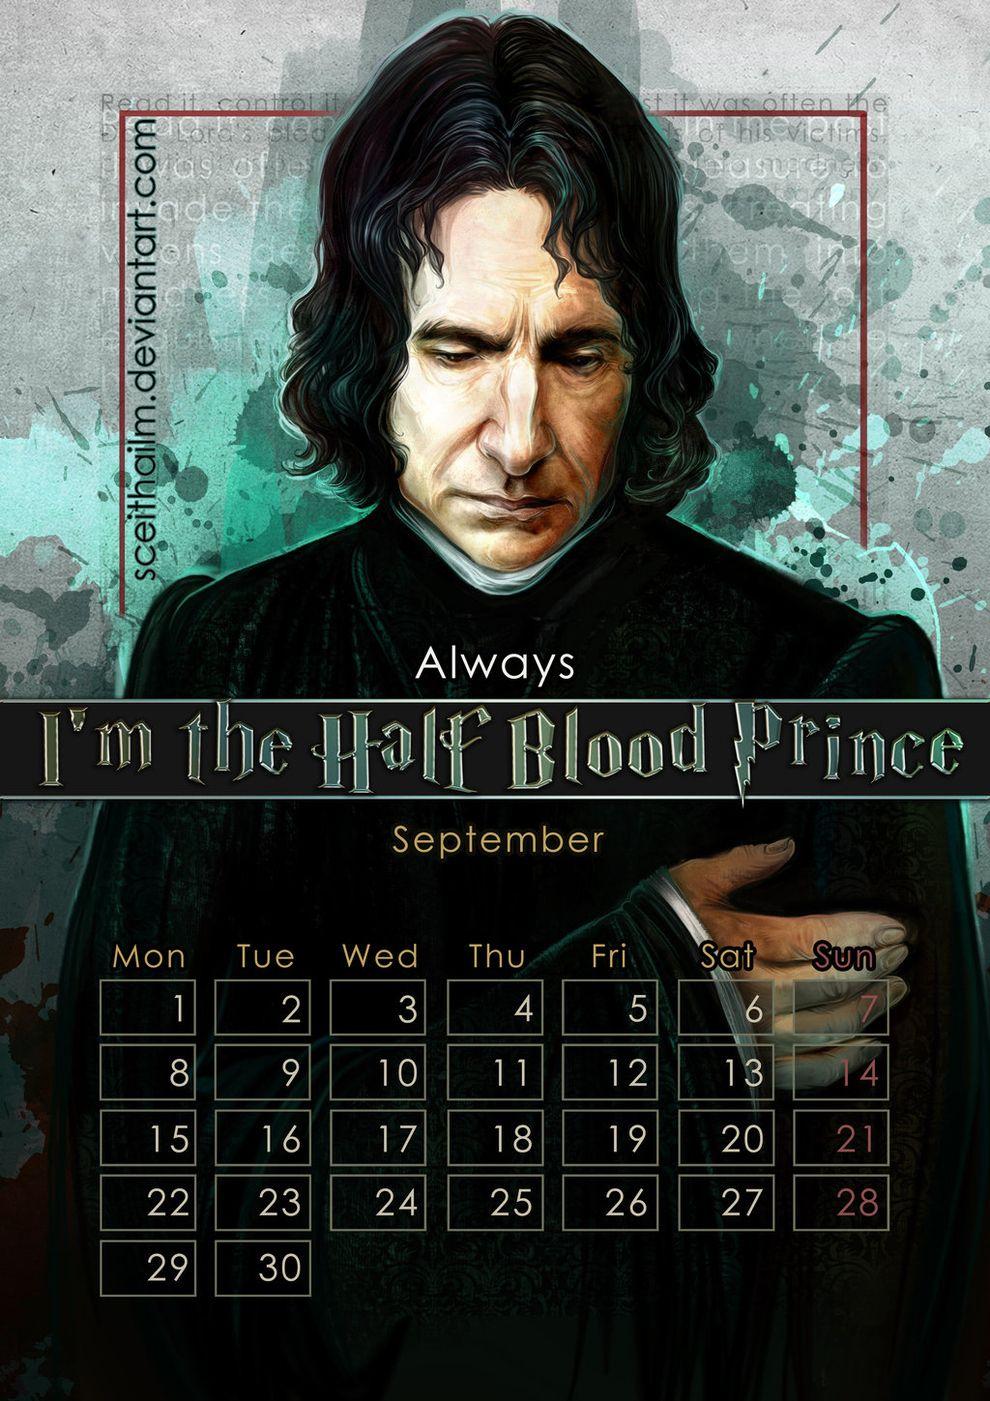 September Alan Rickman As Severus Snape In The Harry Potter Movies Filme Pinnwand Filme Serien